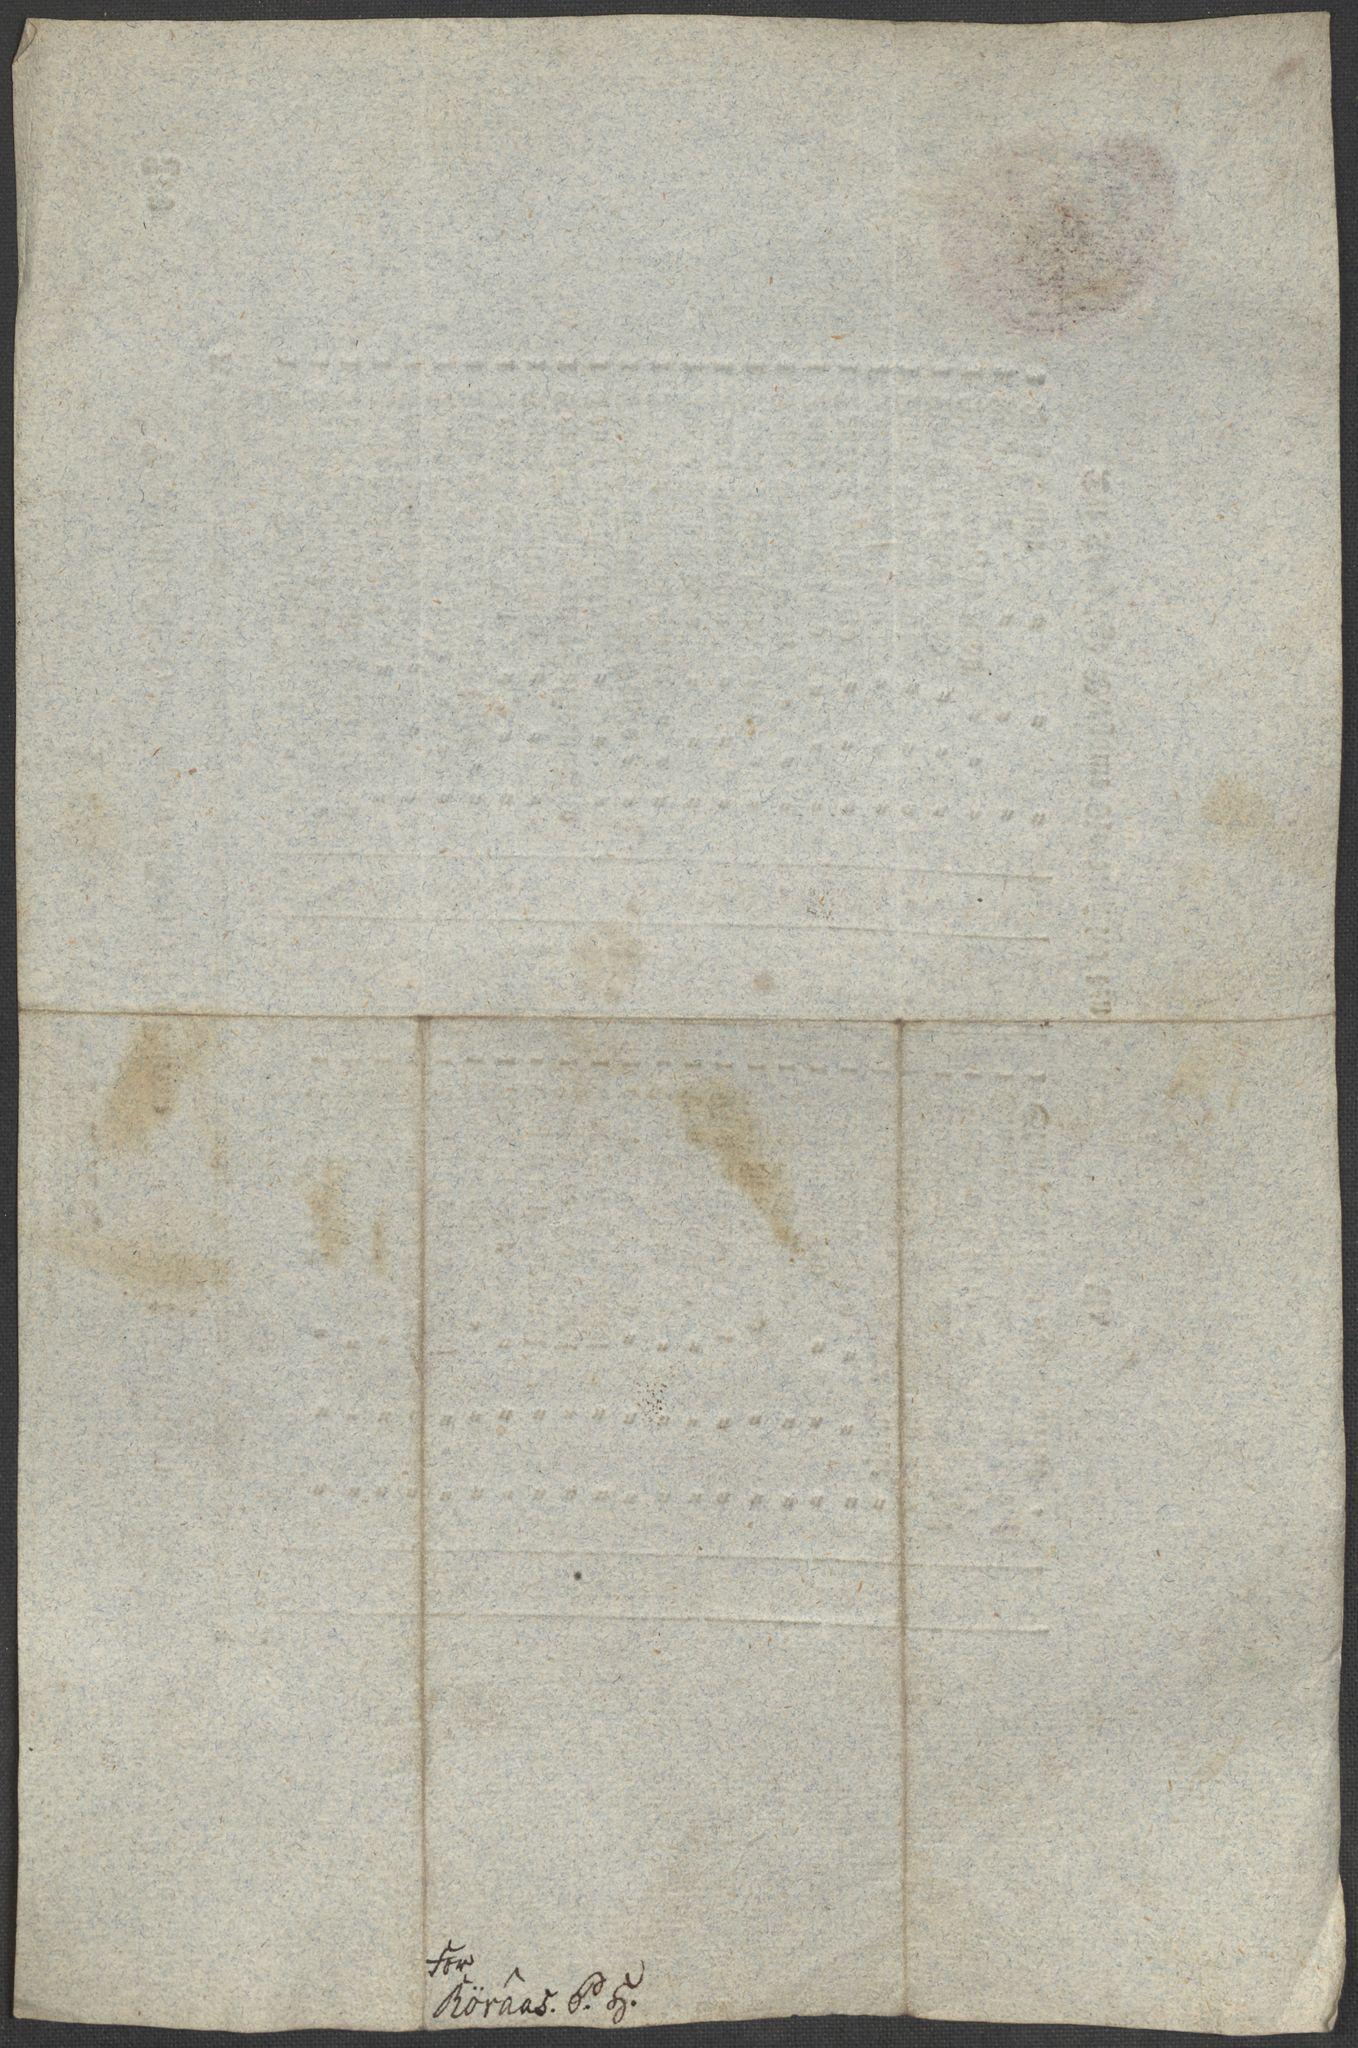 SAT, Røros kobberverk, 12/L0021: 12.20.9 Provianttakster, 1765-1824, s. 115